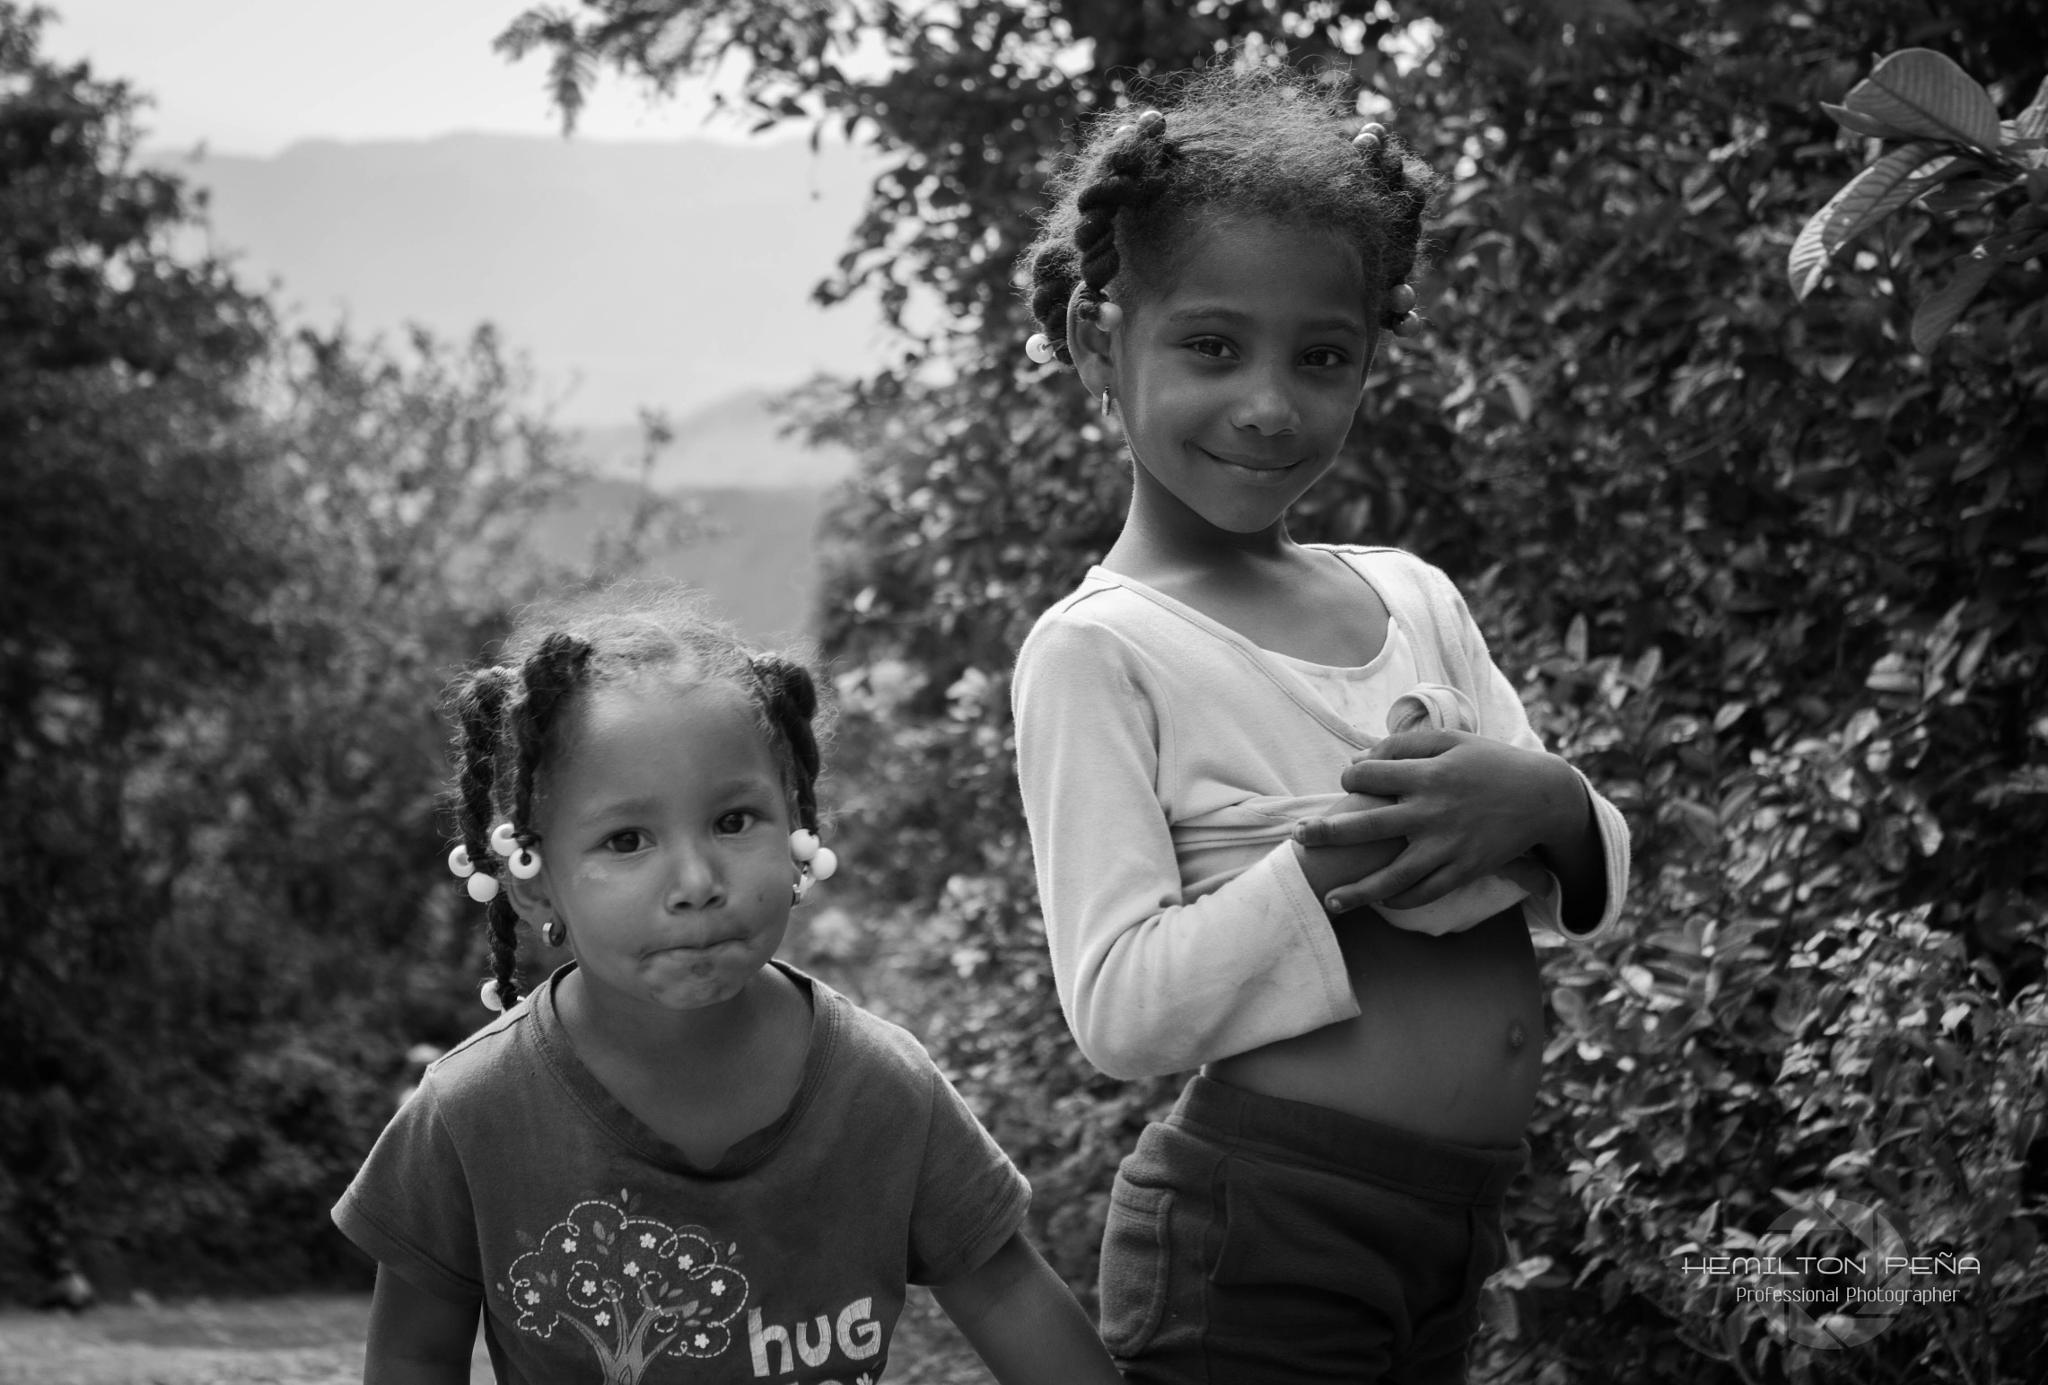 Girls by Hemilton Peña